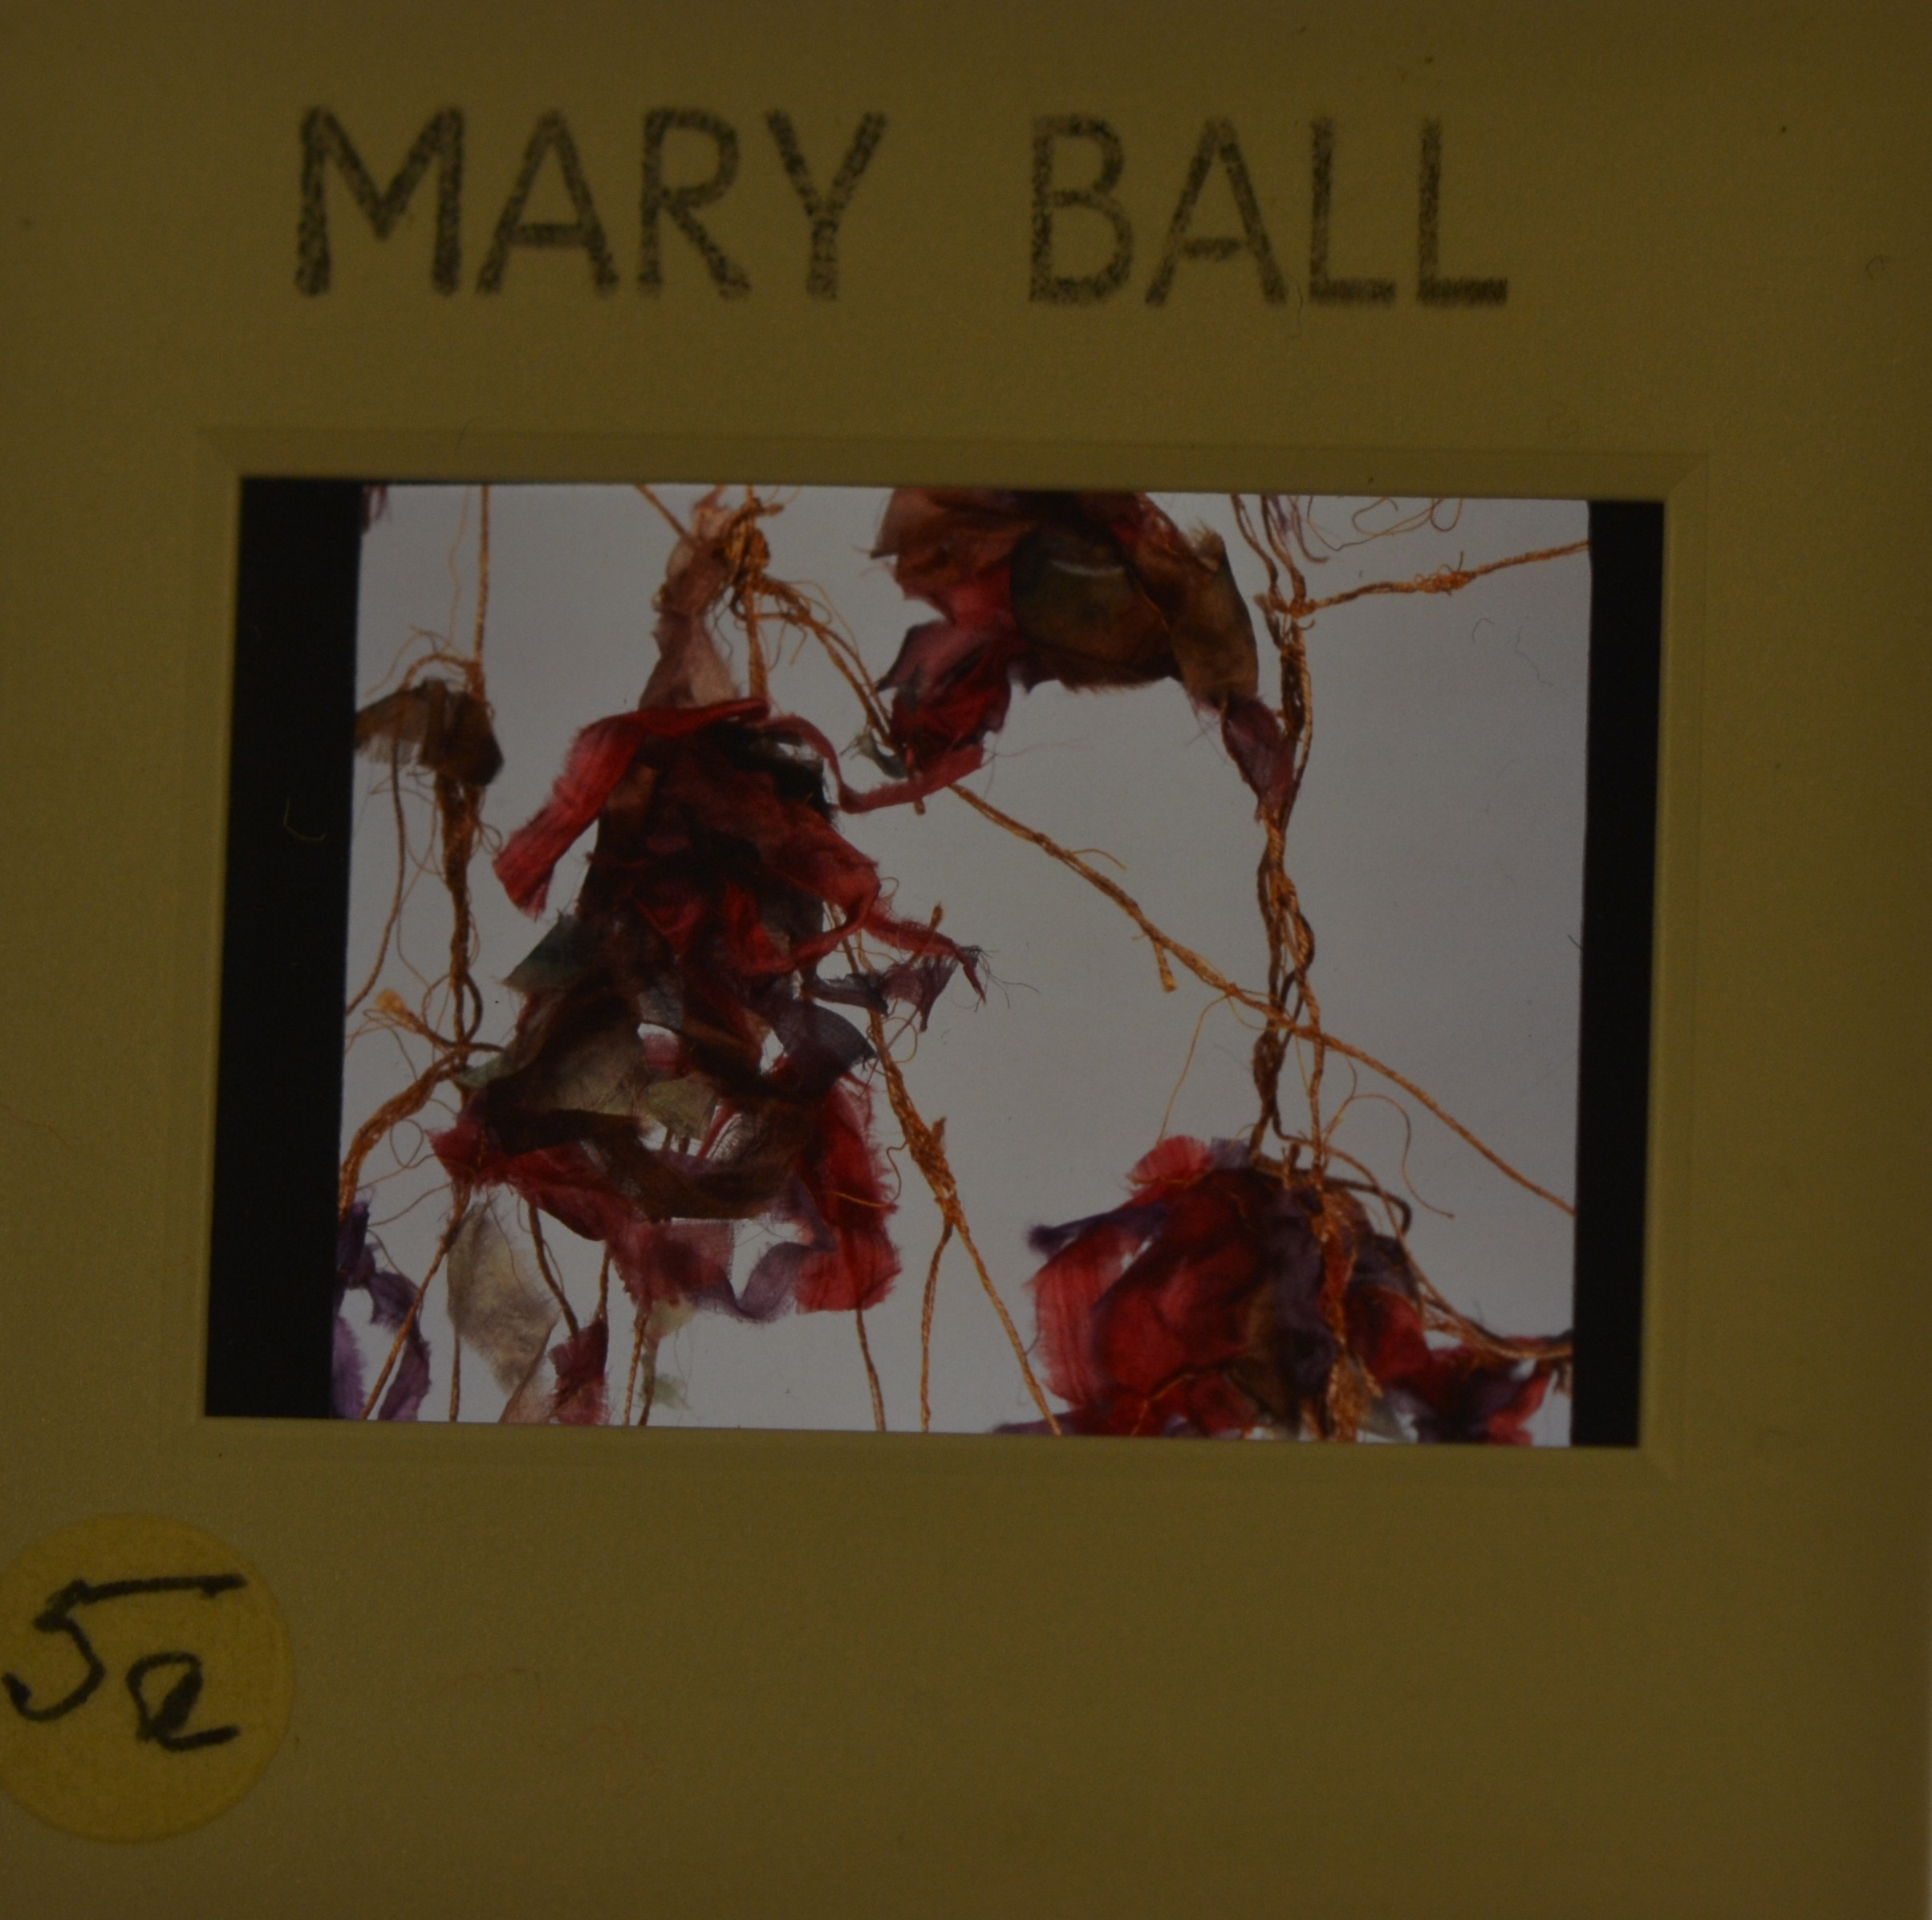 MARY BALL S23.jpg